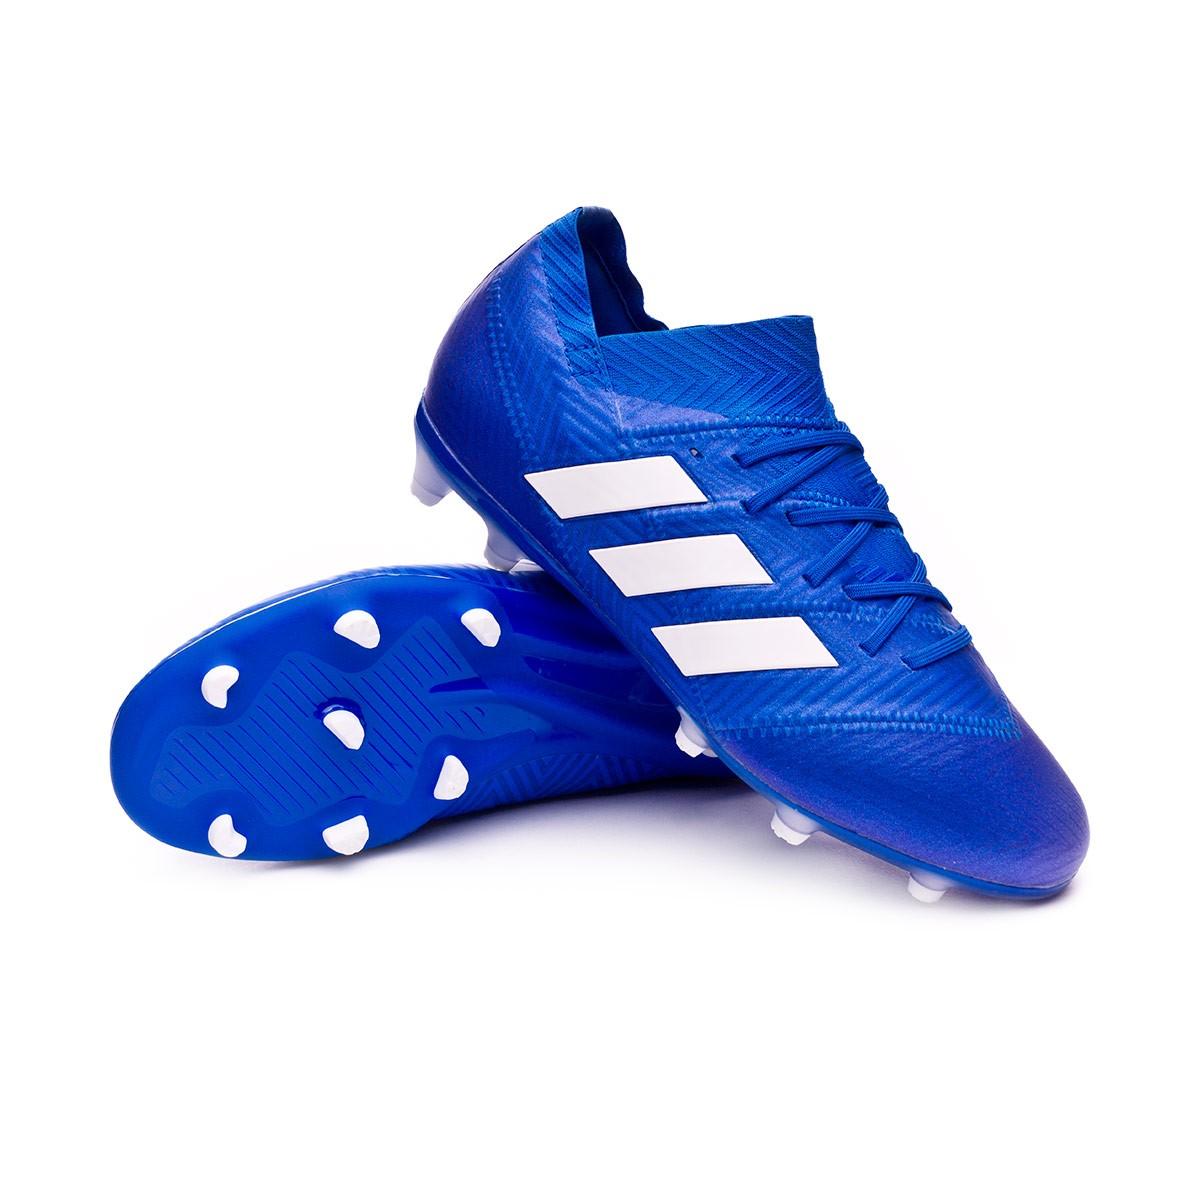 85dcab121 adidas Kids Nemeziz 18.1 FG Football Boots. Football blue-White-Football ...